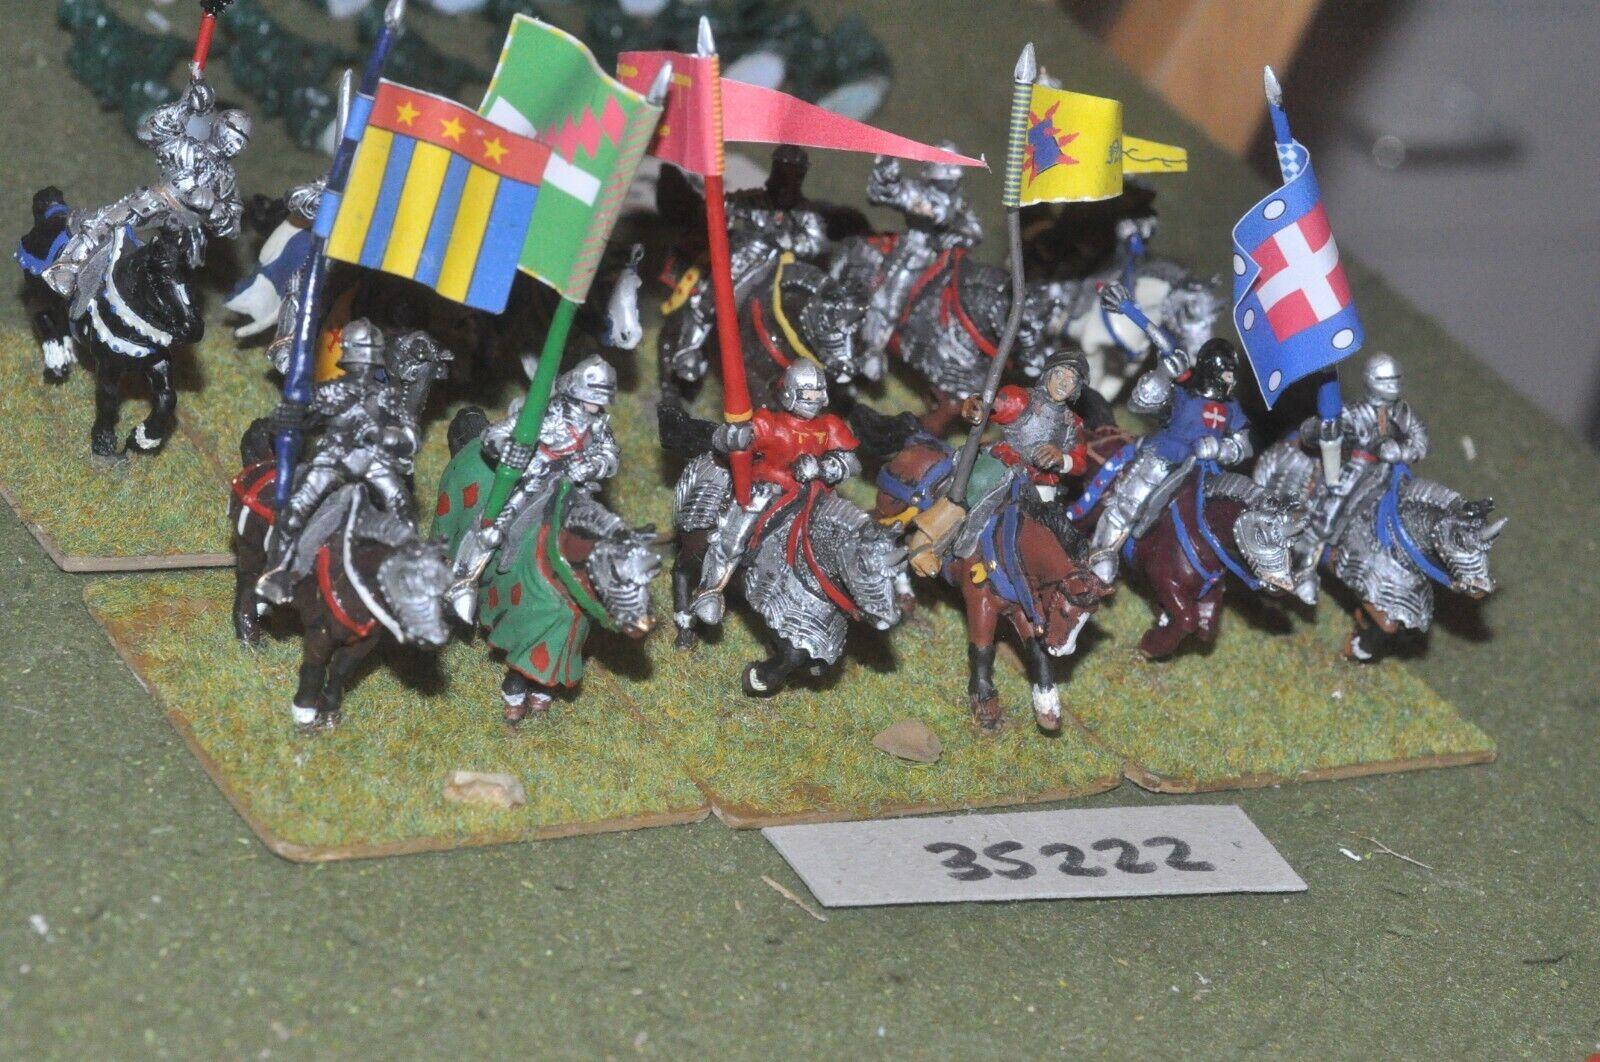 25mm medieval   burgundian - men at arms 12 figures - cav (35222)